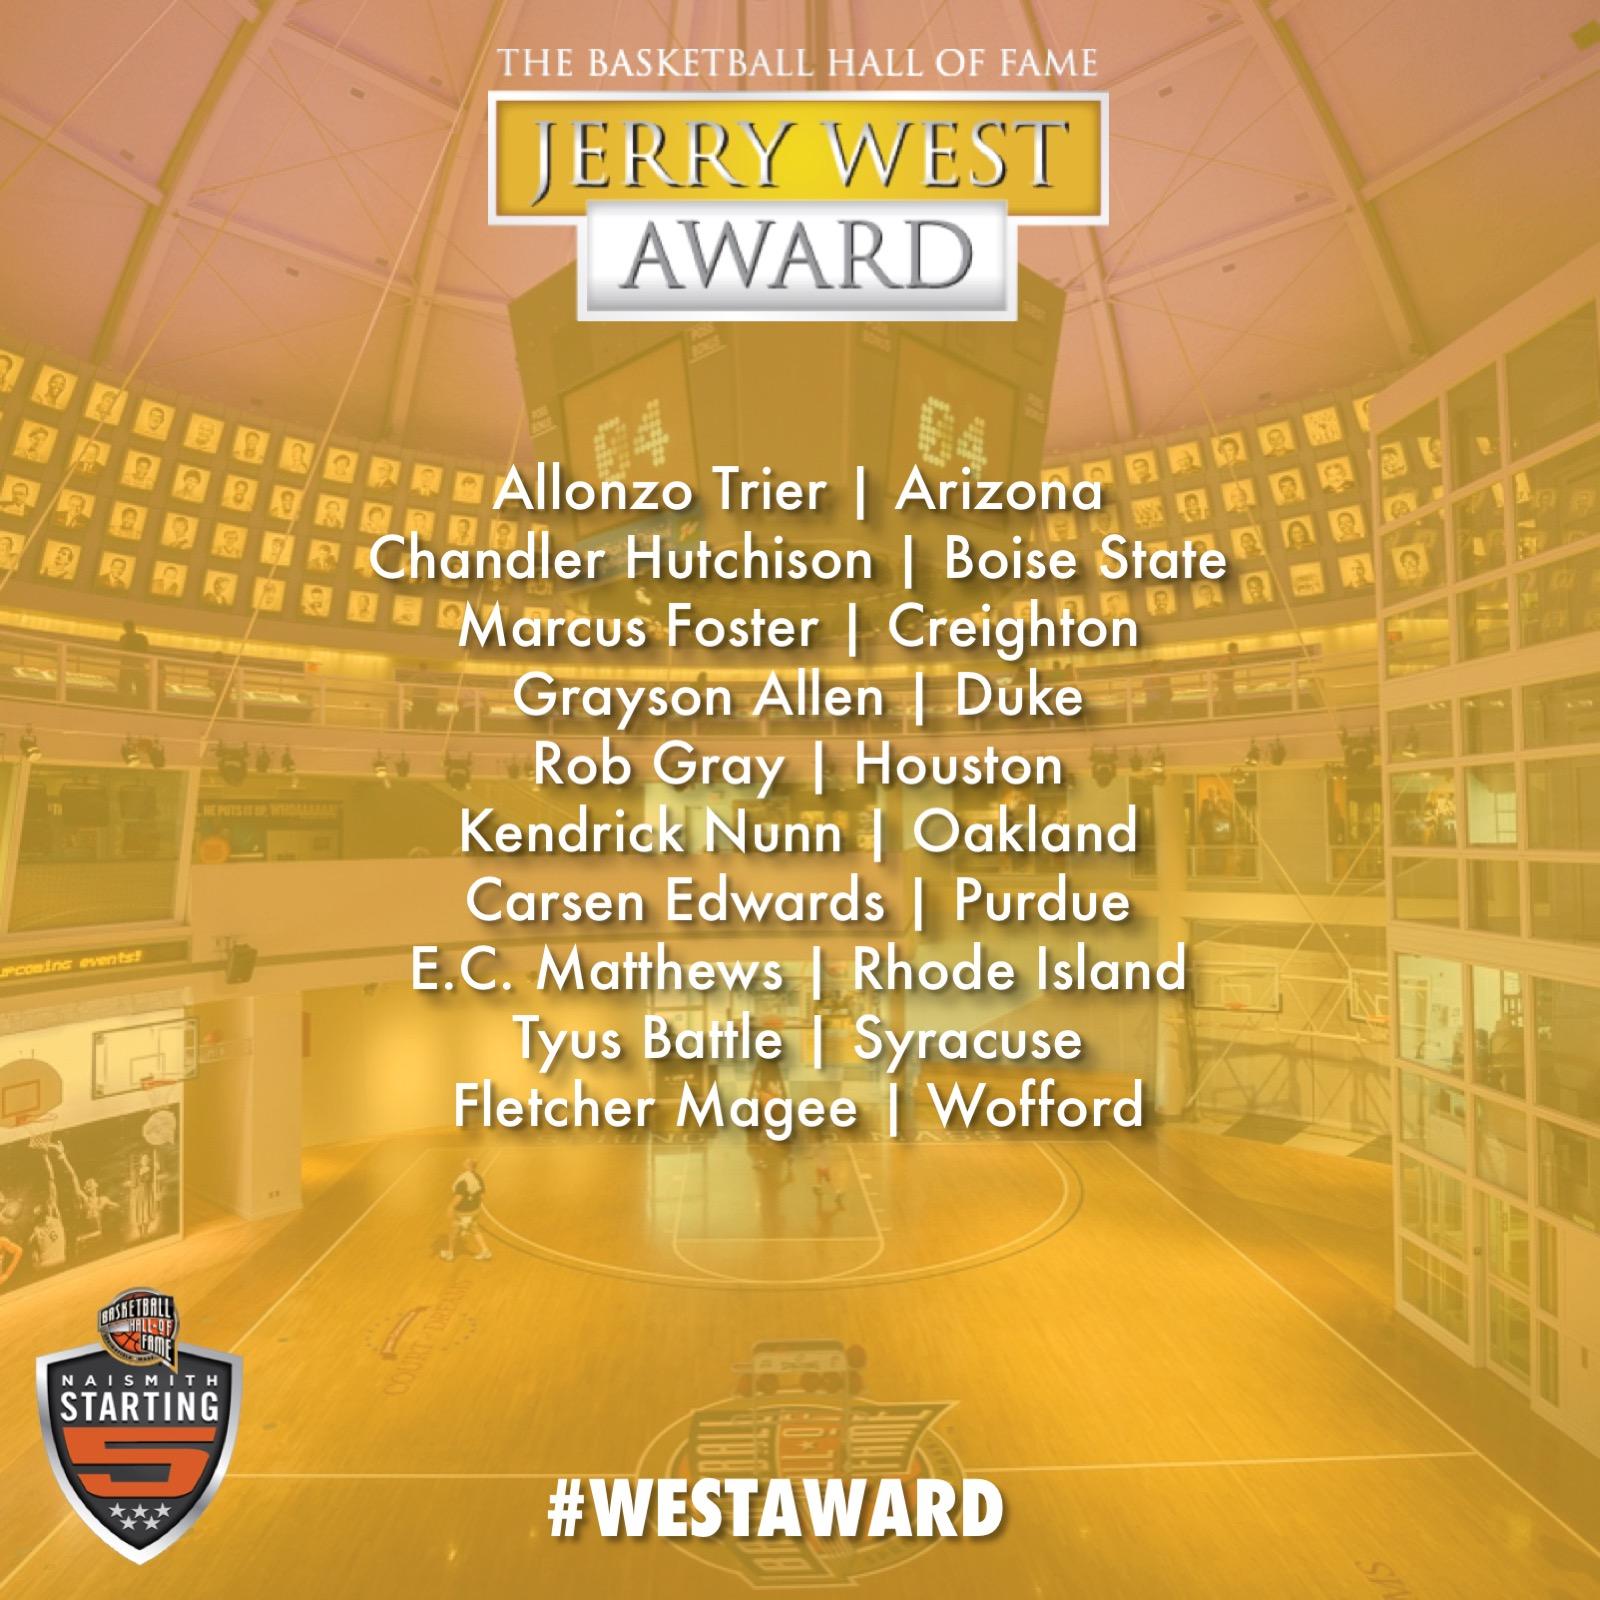 West Award 2.jpg